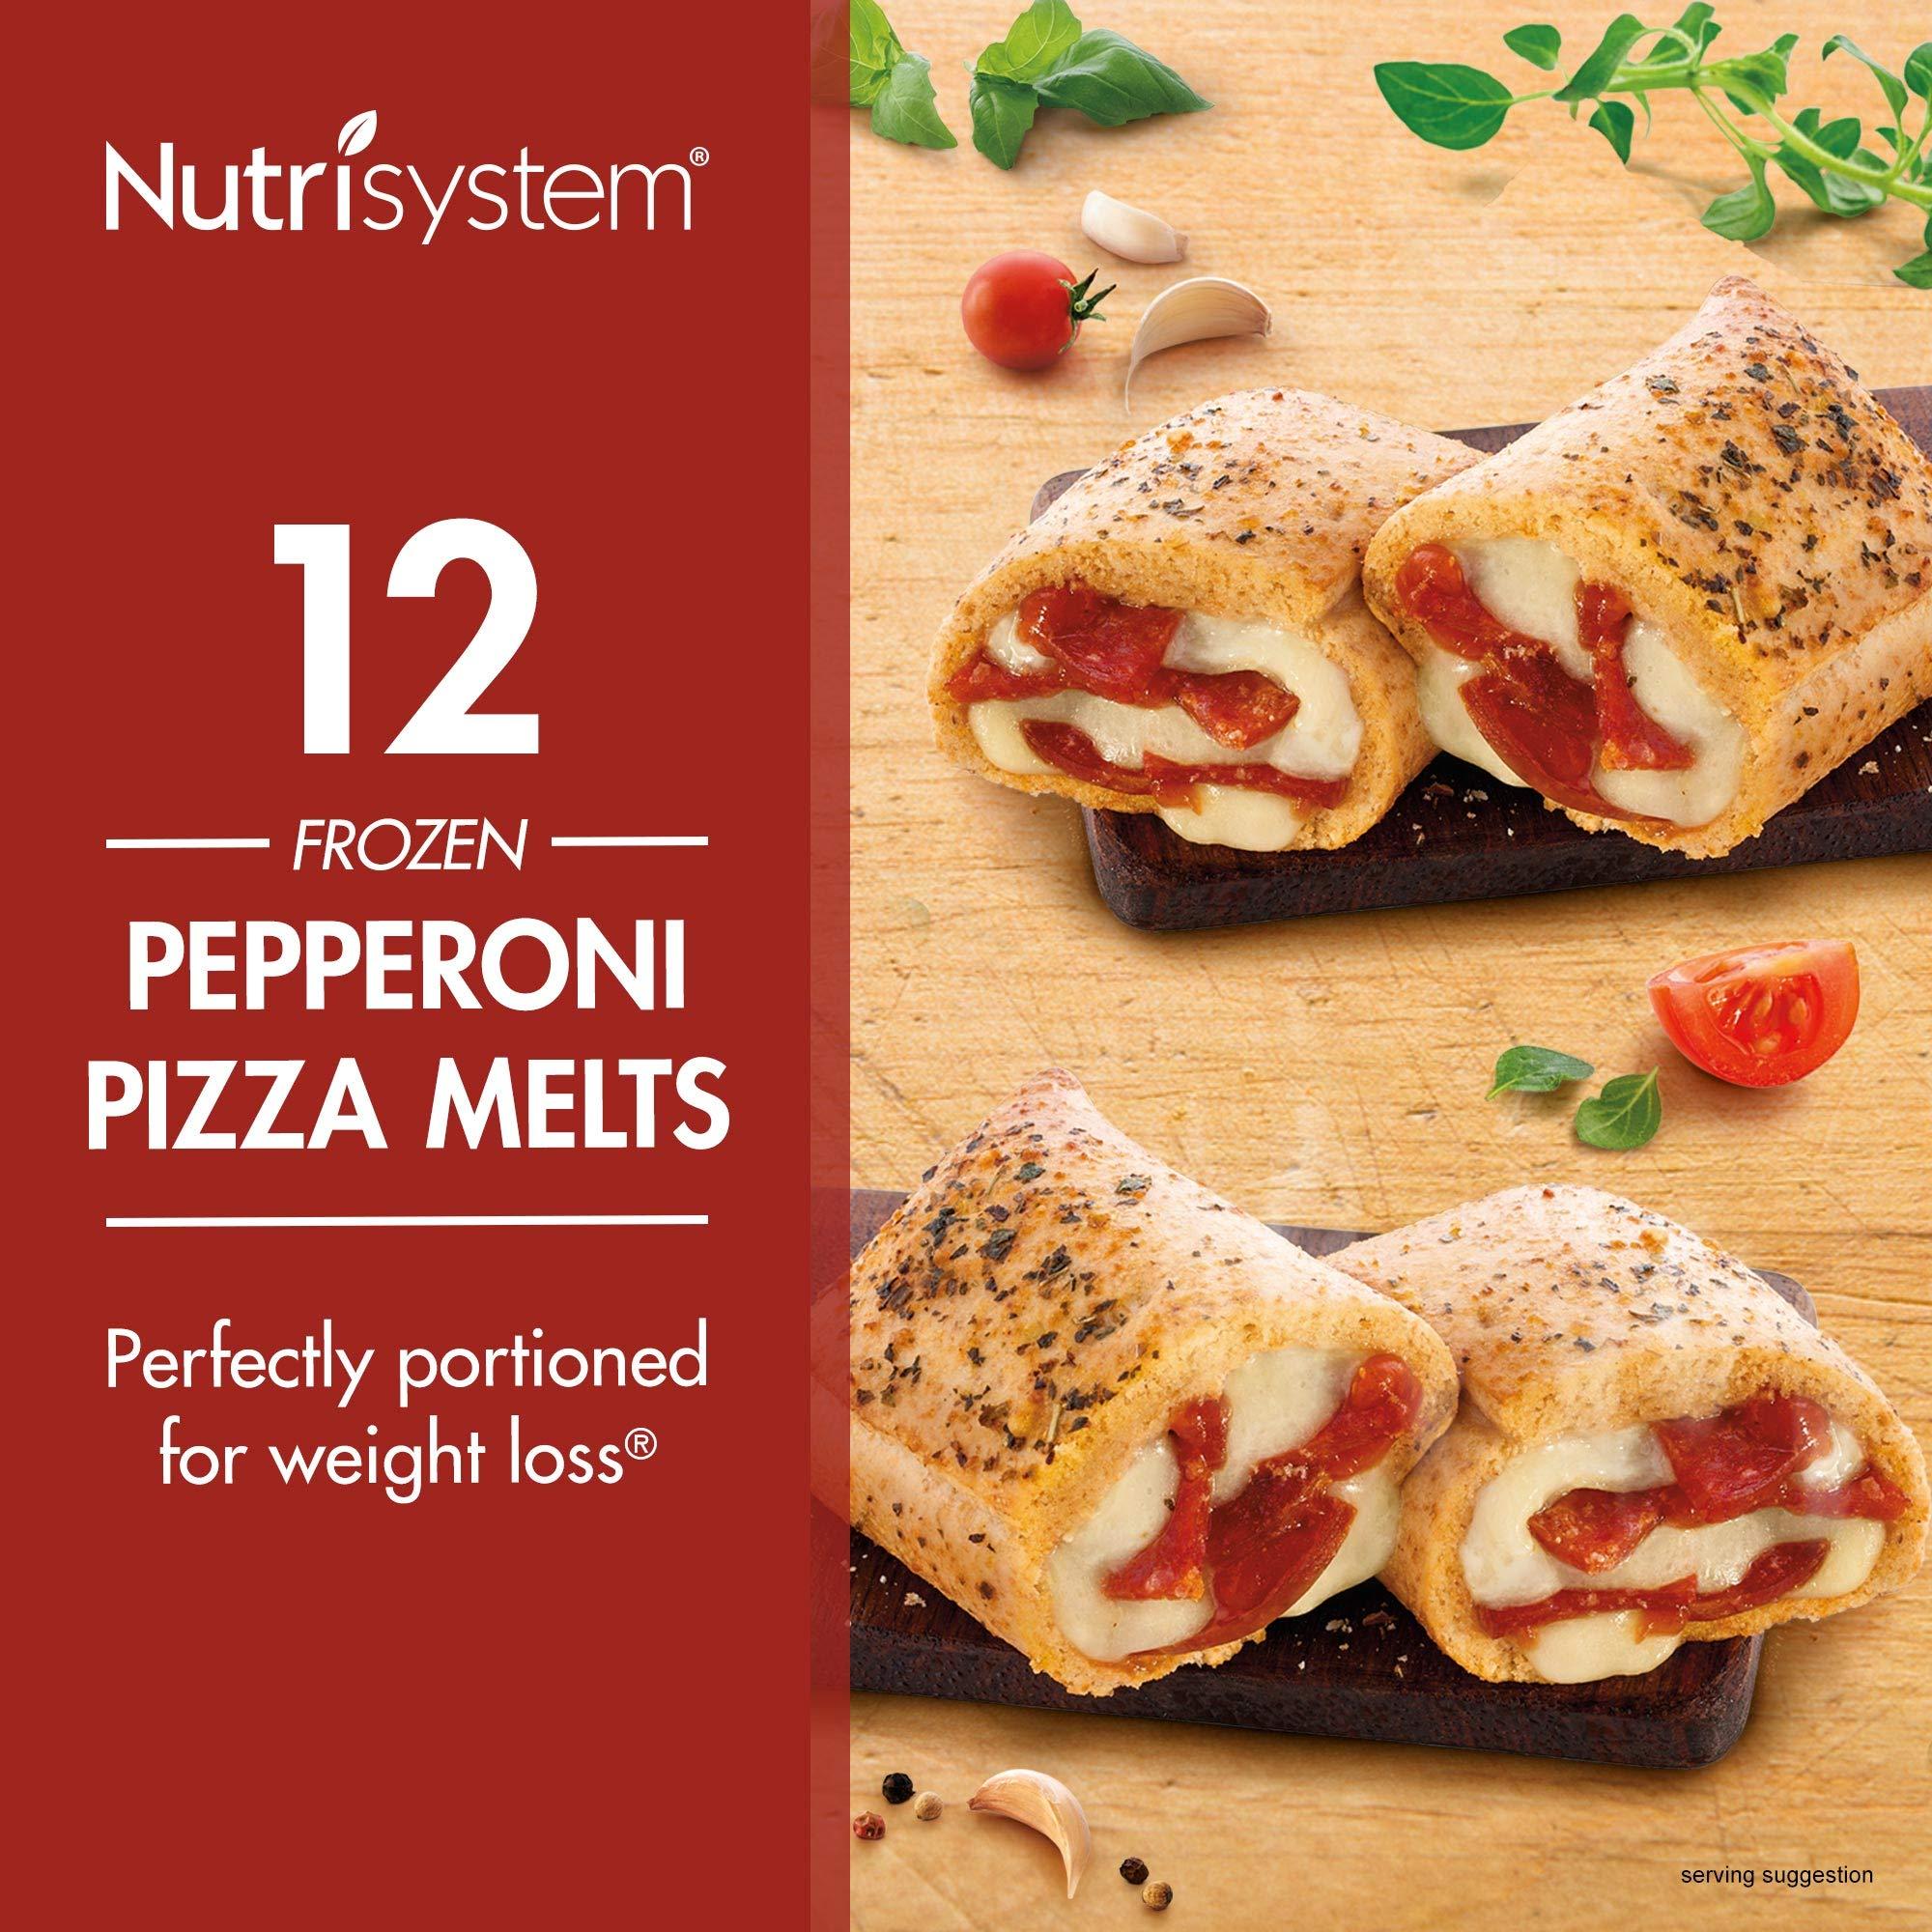 Nutrisystem® Pepperoni Pizza Lunch Melt, 12 Count (Frozen)